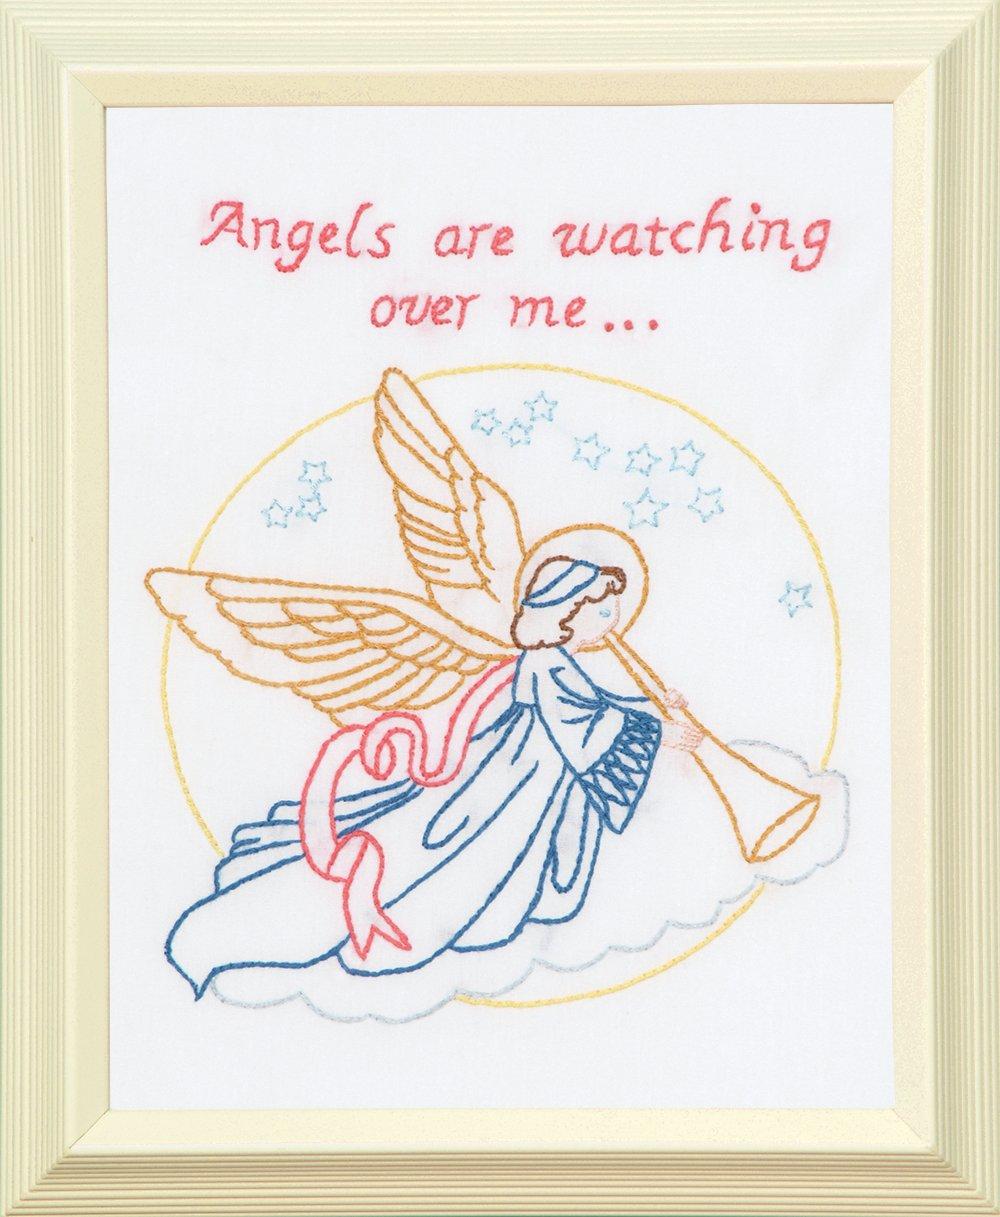 0161-269 8 x 10 (9 x11) Sampler (pr) Angel